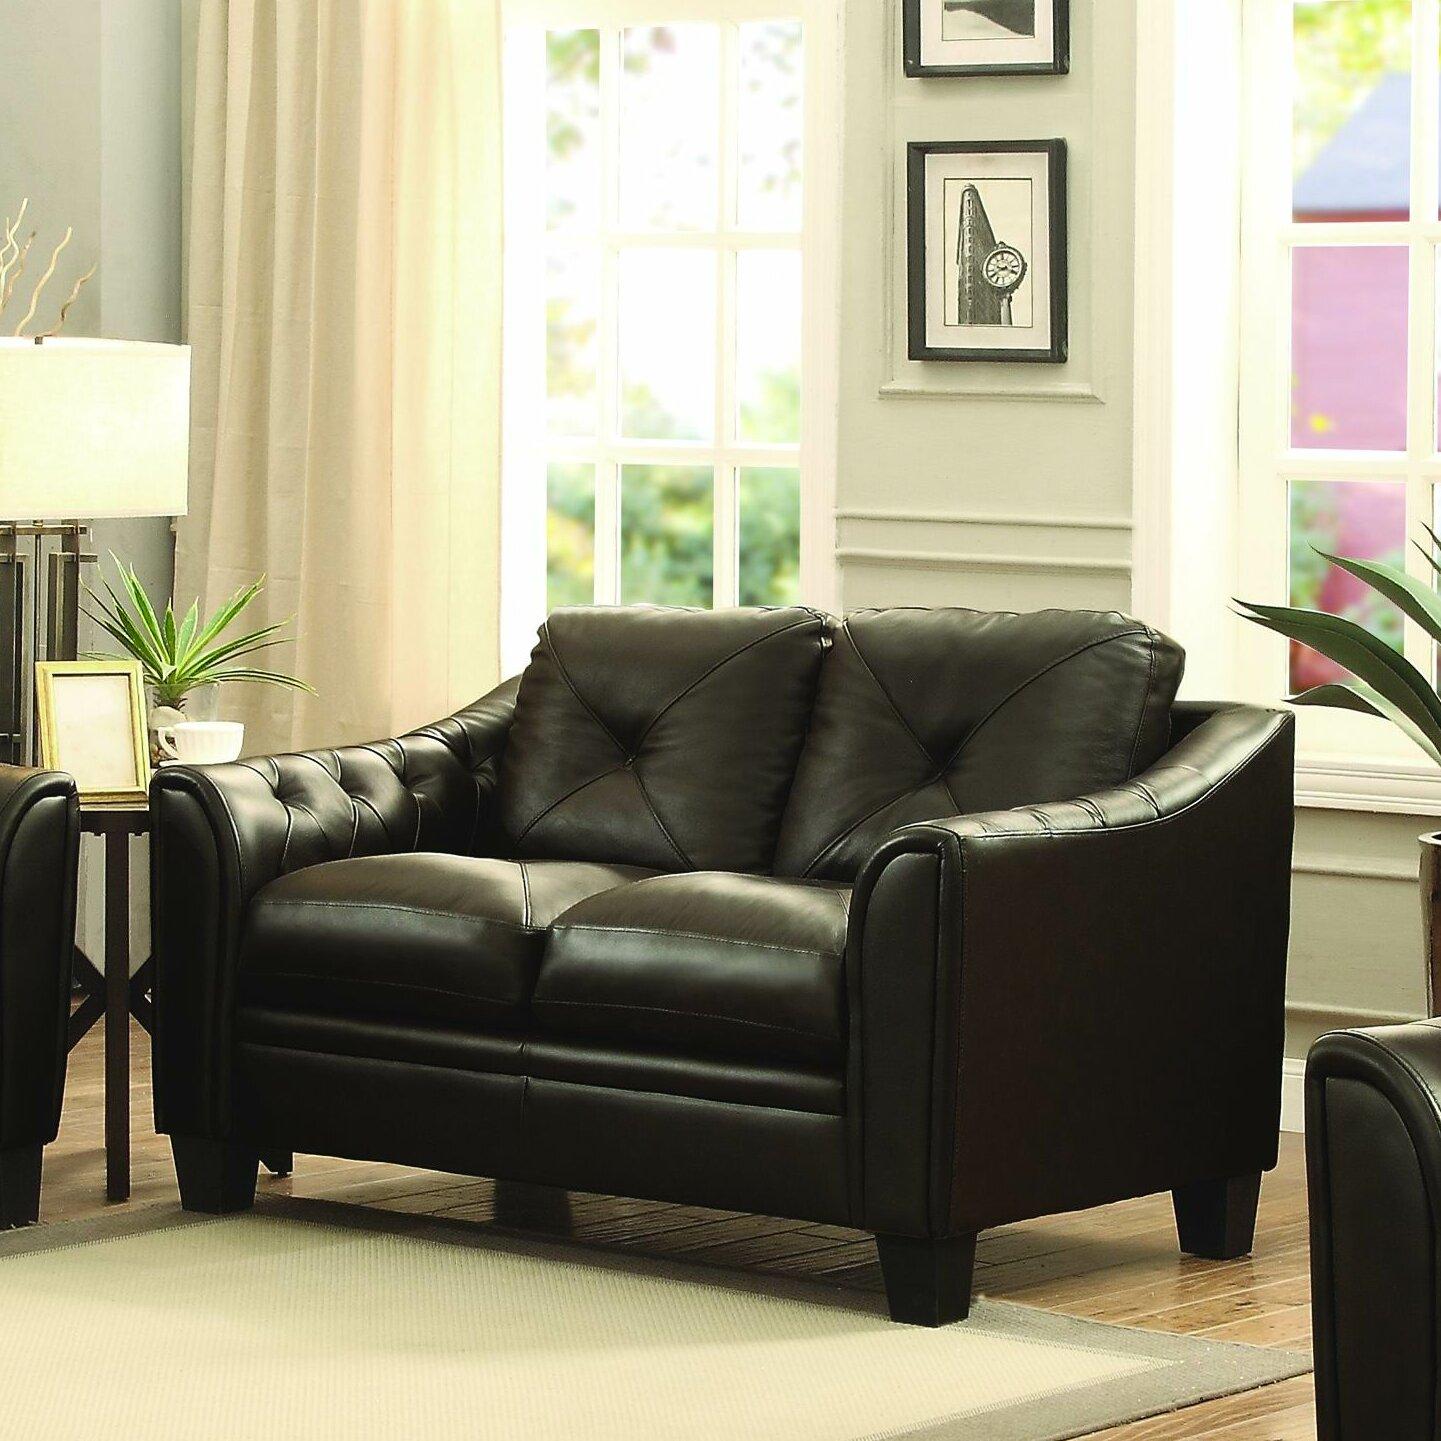 Homelegance Memphis Living Room Collection Wayfair